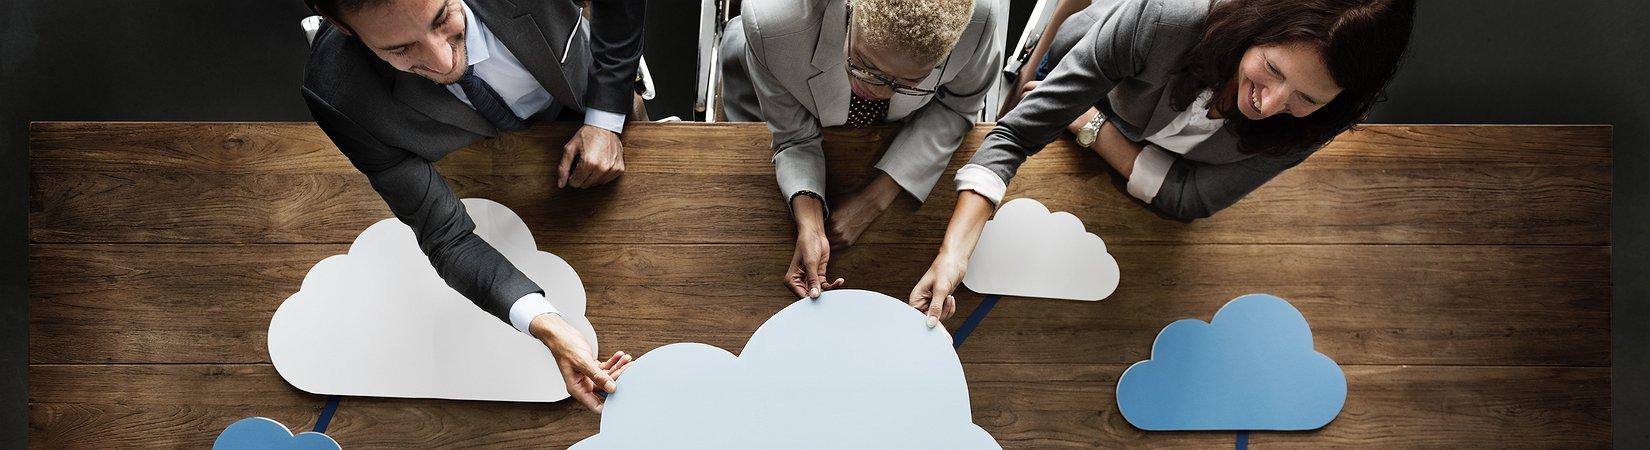 Amazon poderá vender o seu segmento de serviços na nuvem na China